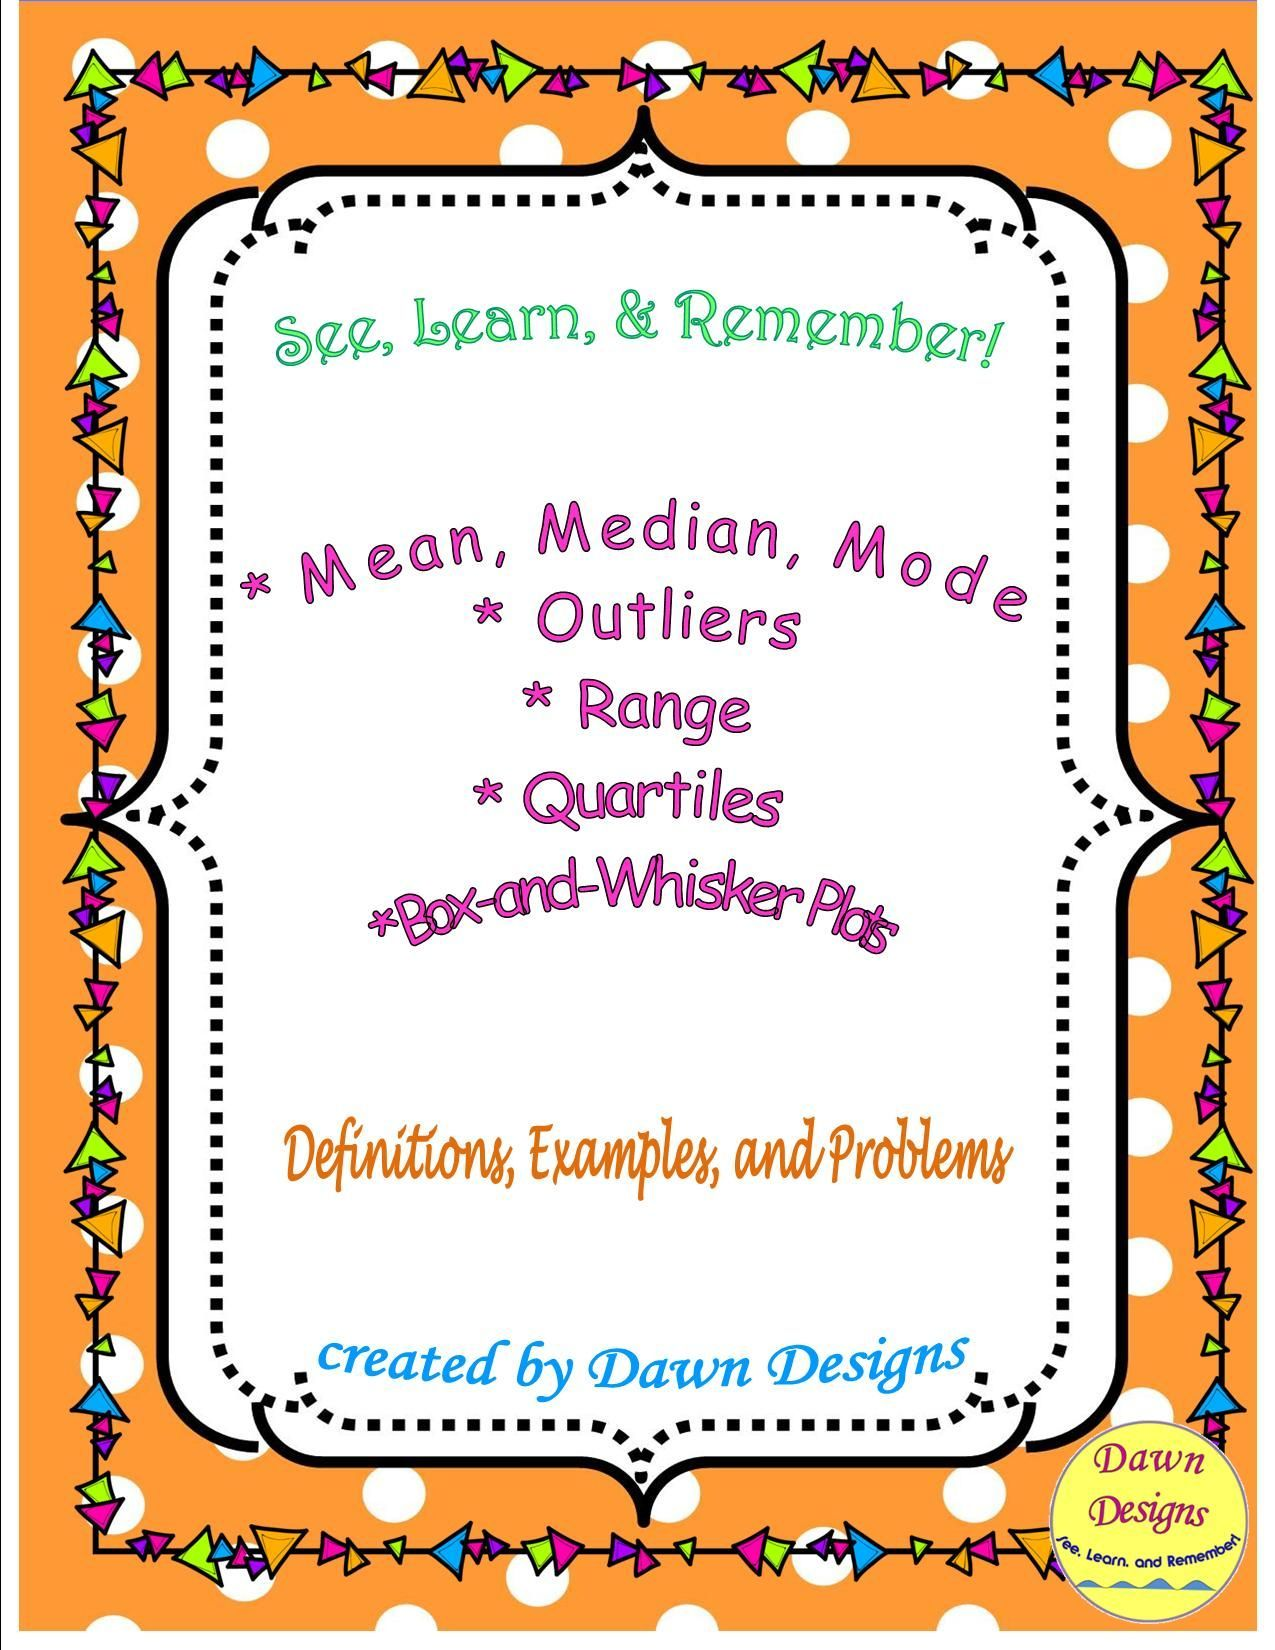 Statistics Mean Median Mode Outliers Range Quartiles